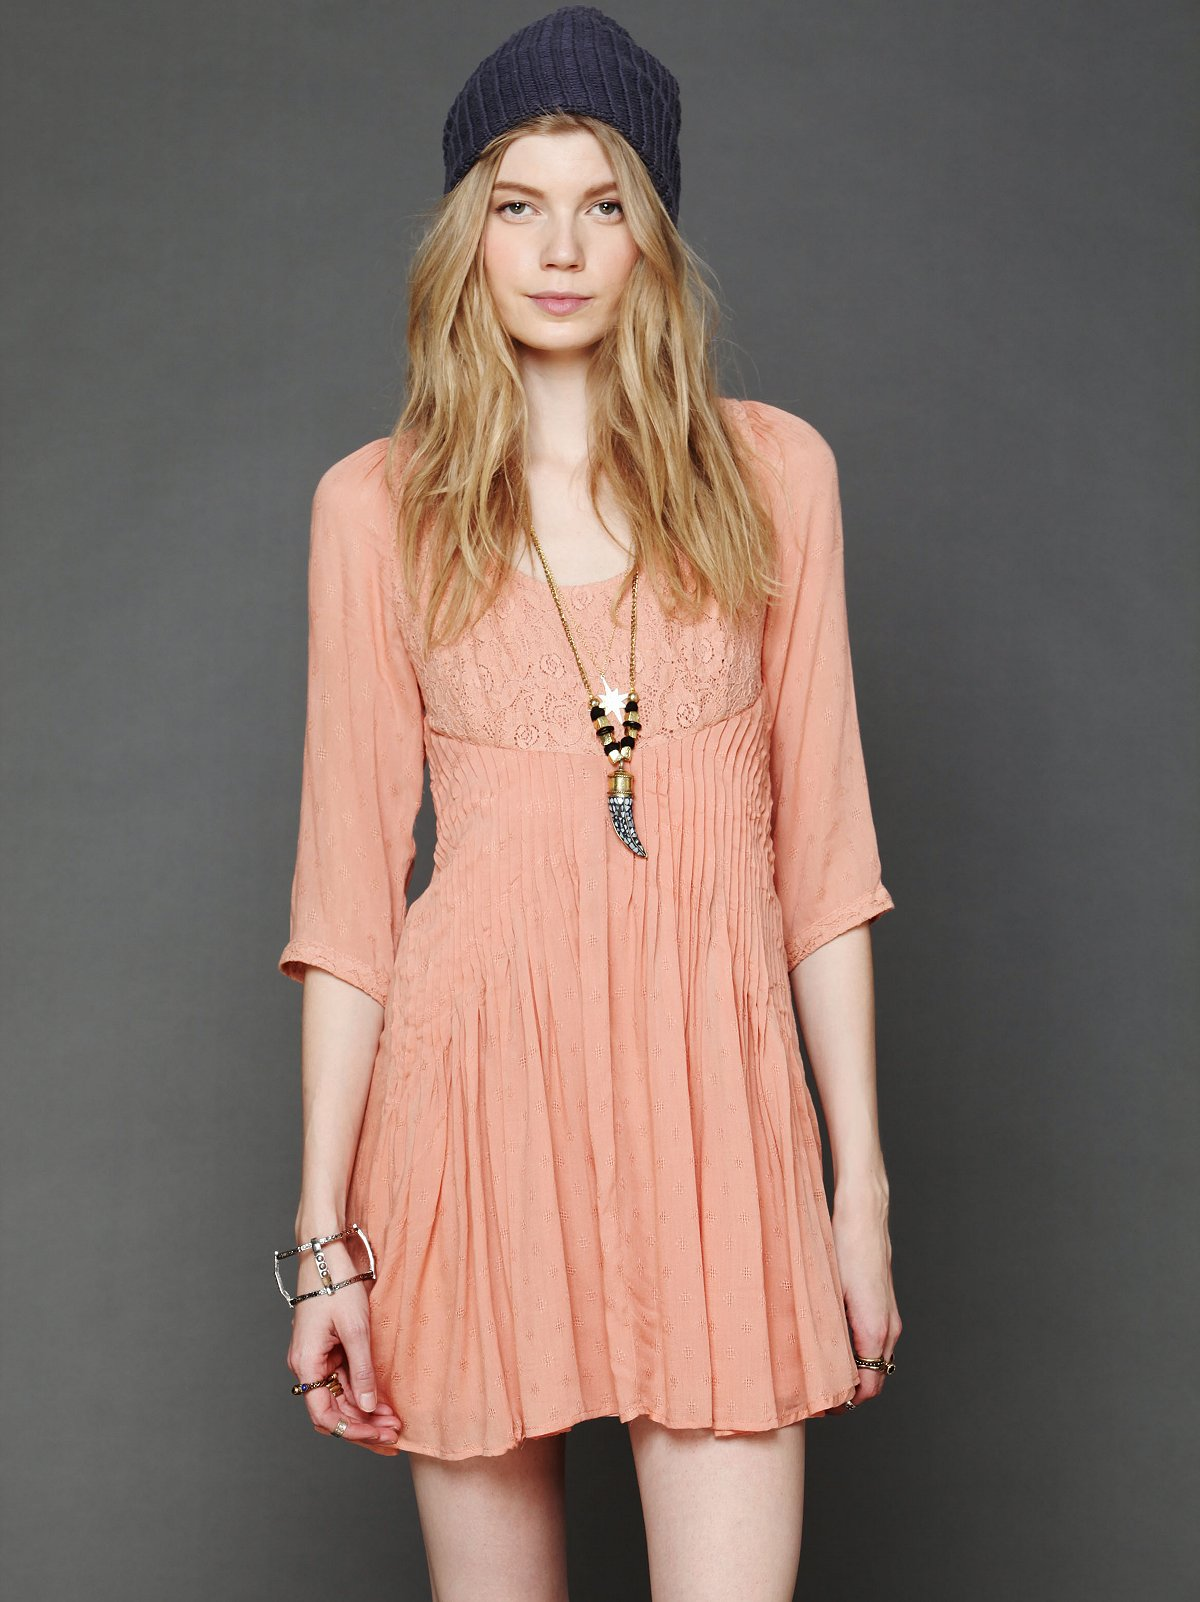 Oh! Darling Dress